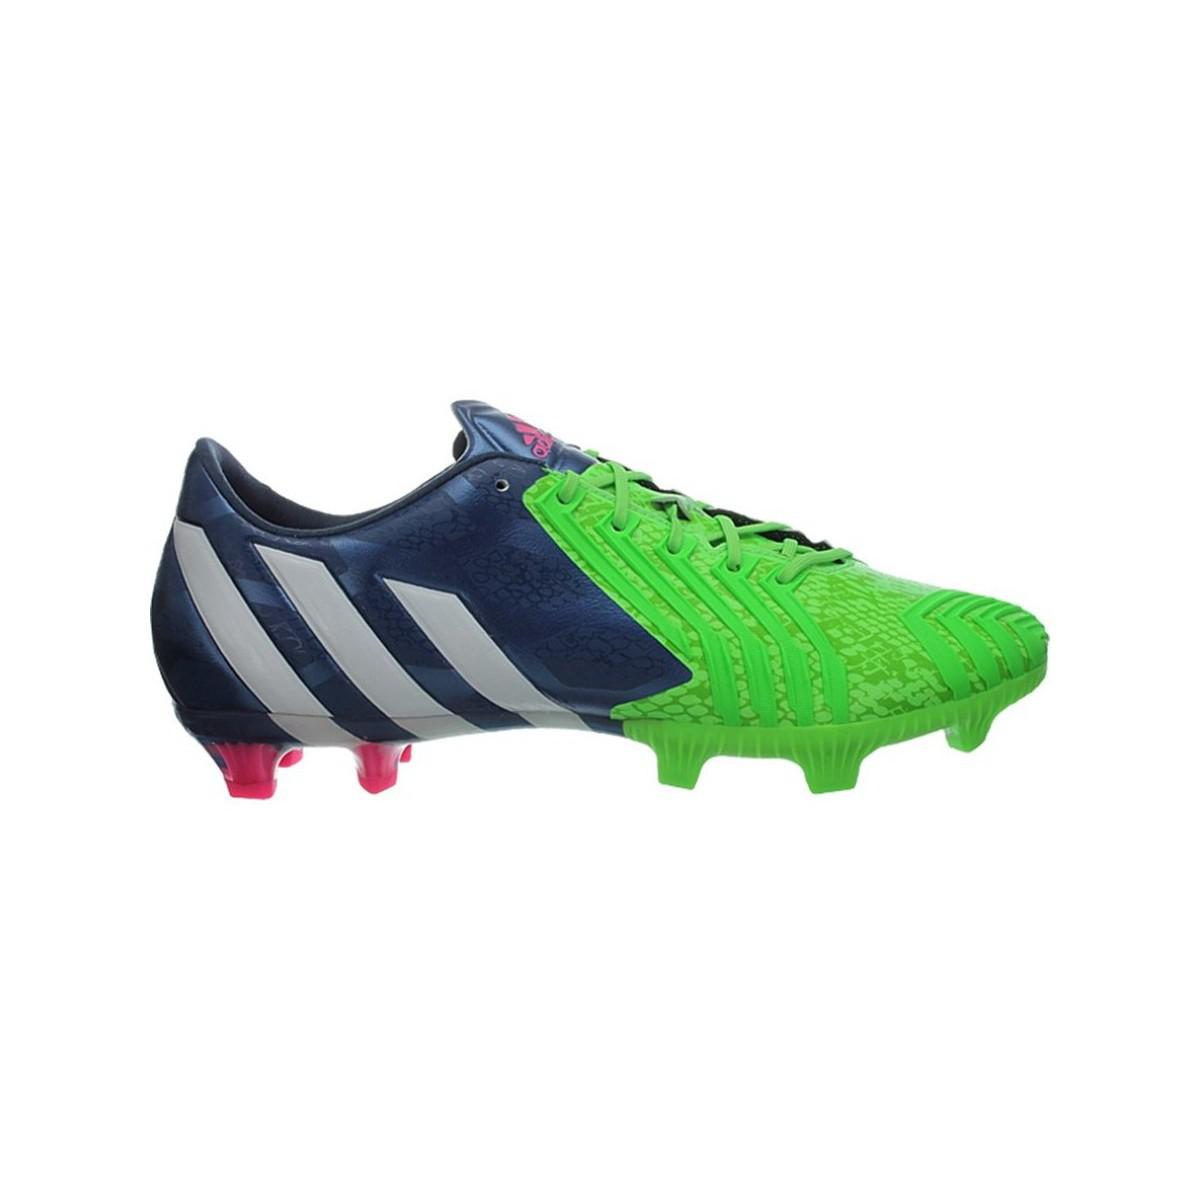 separation shoes 13ccf 1c968 adidas. Predator Instinct Fg Men s ...